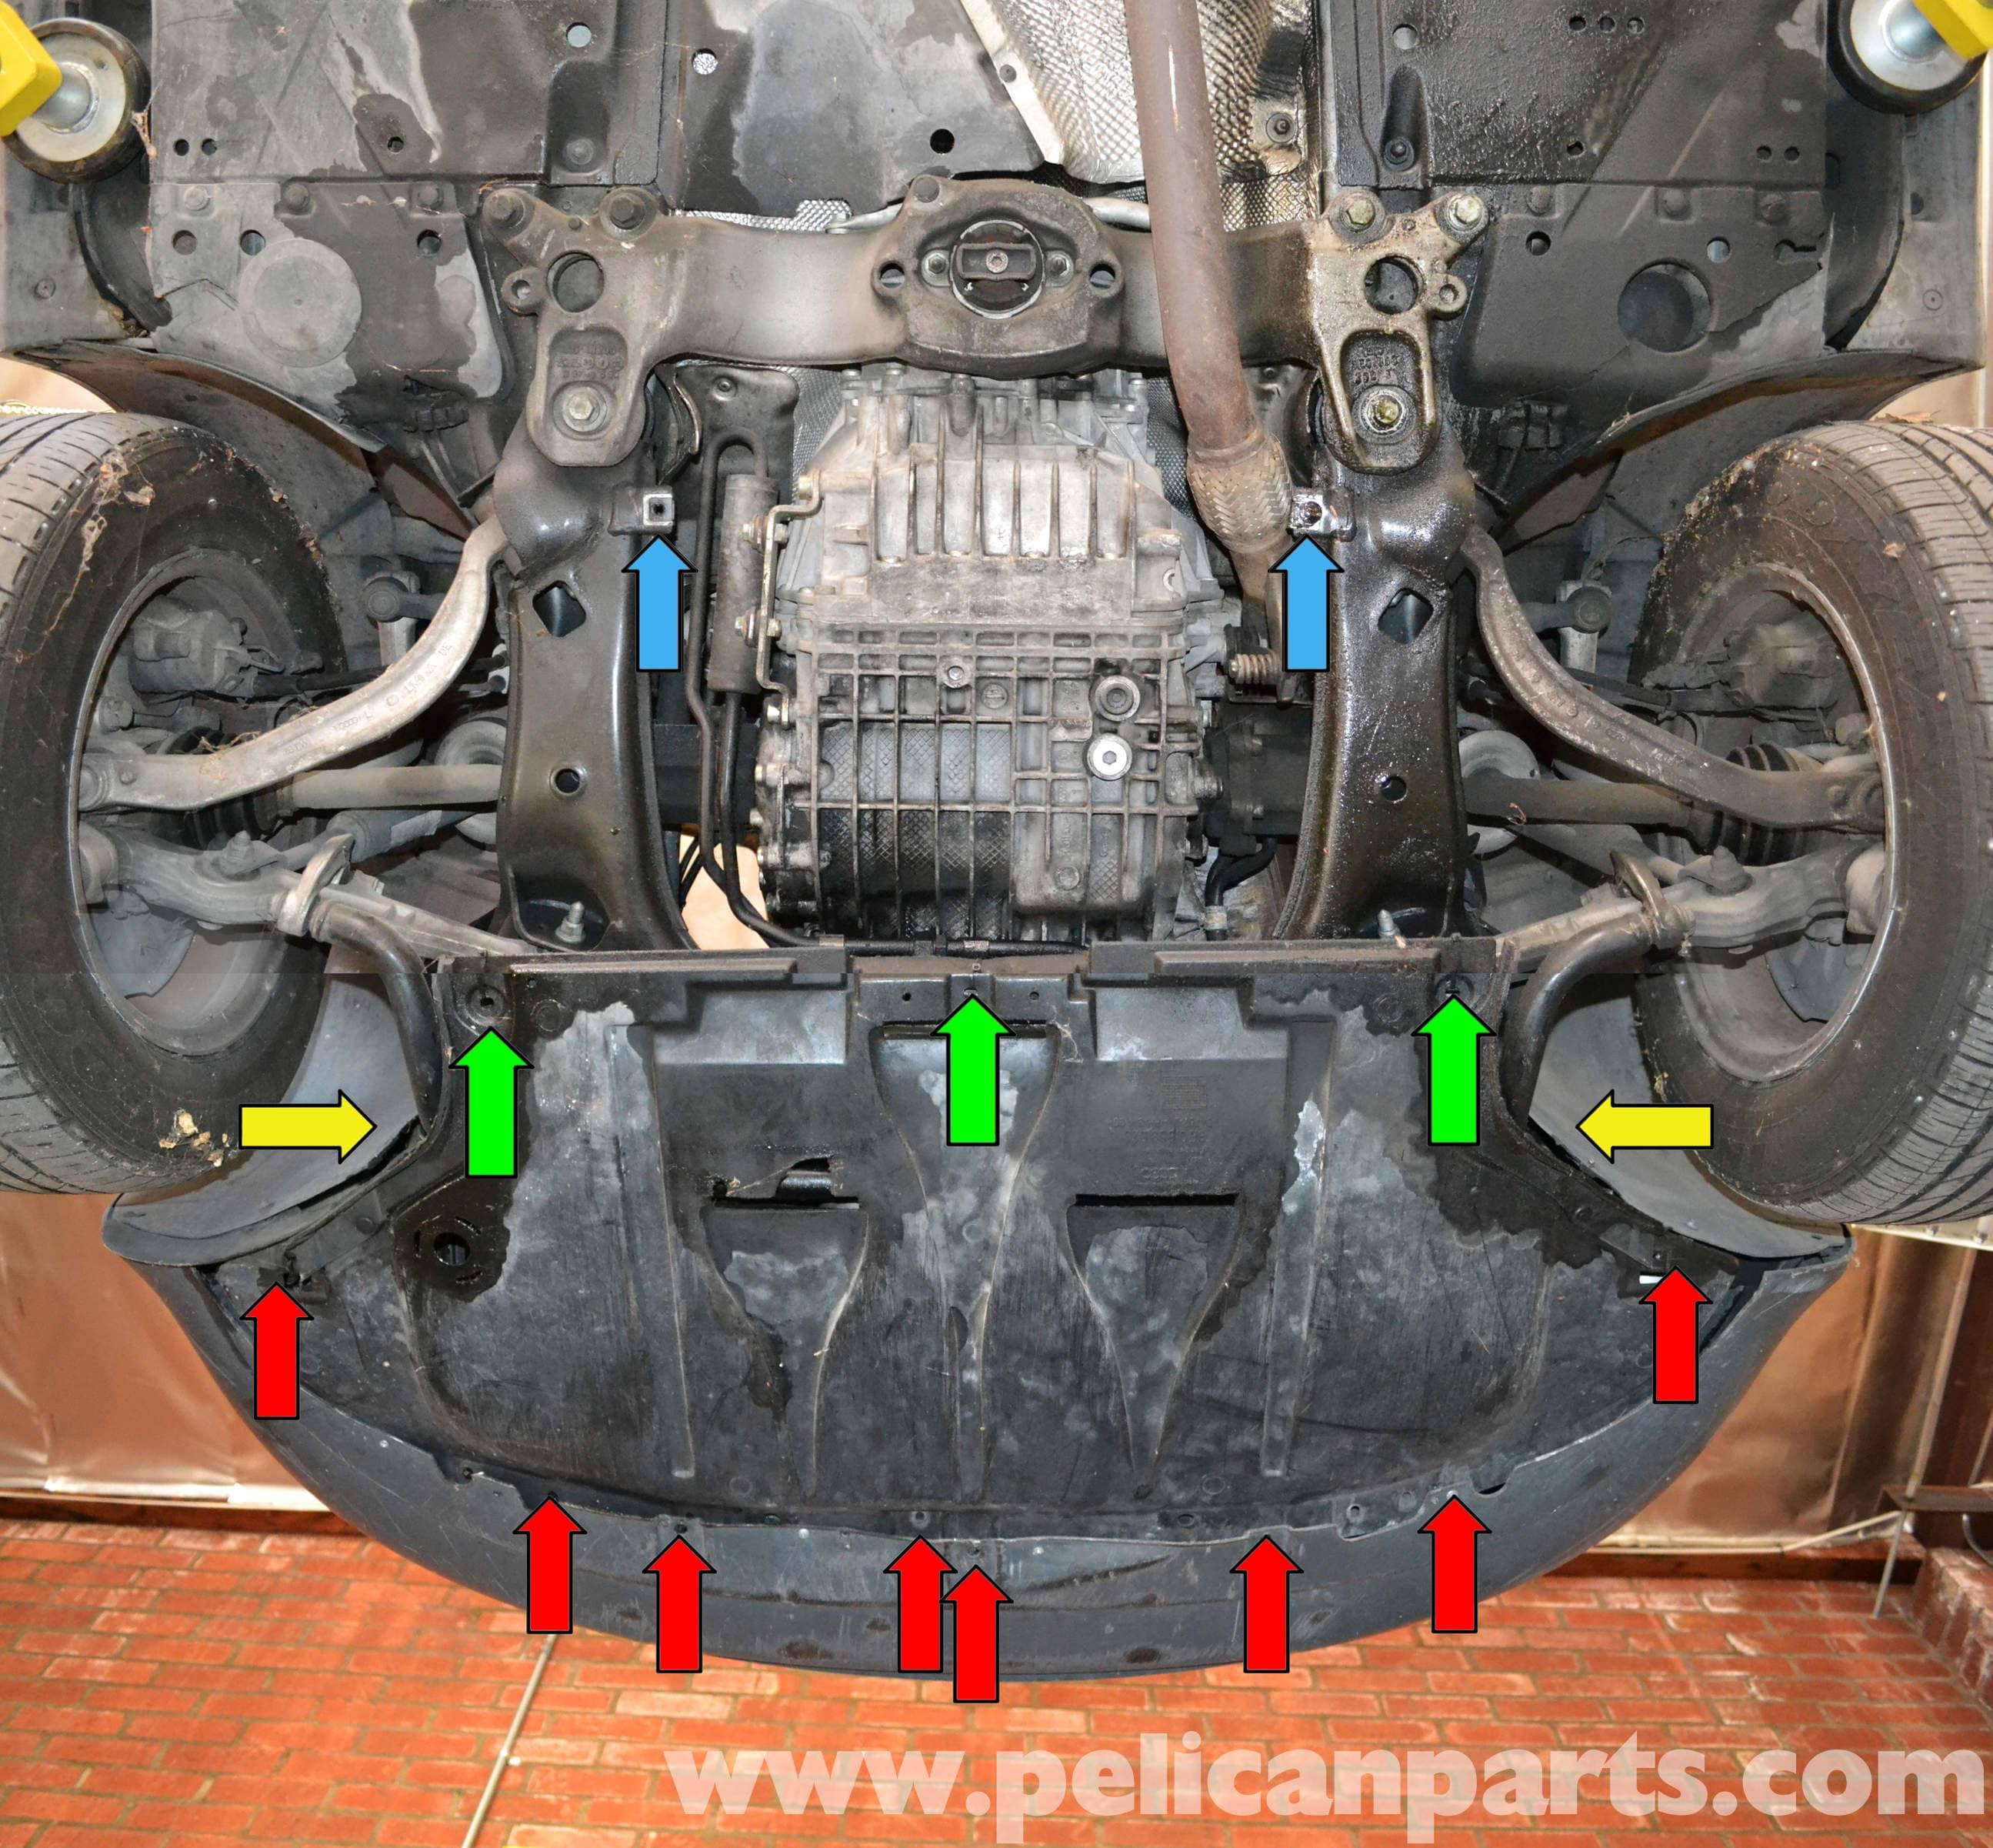 Audi A4 B6 Torque Mount Bushing Replacement 2002 2008